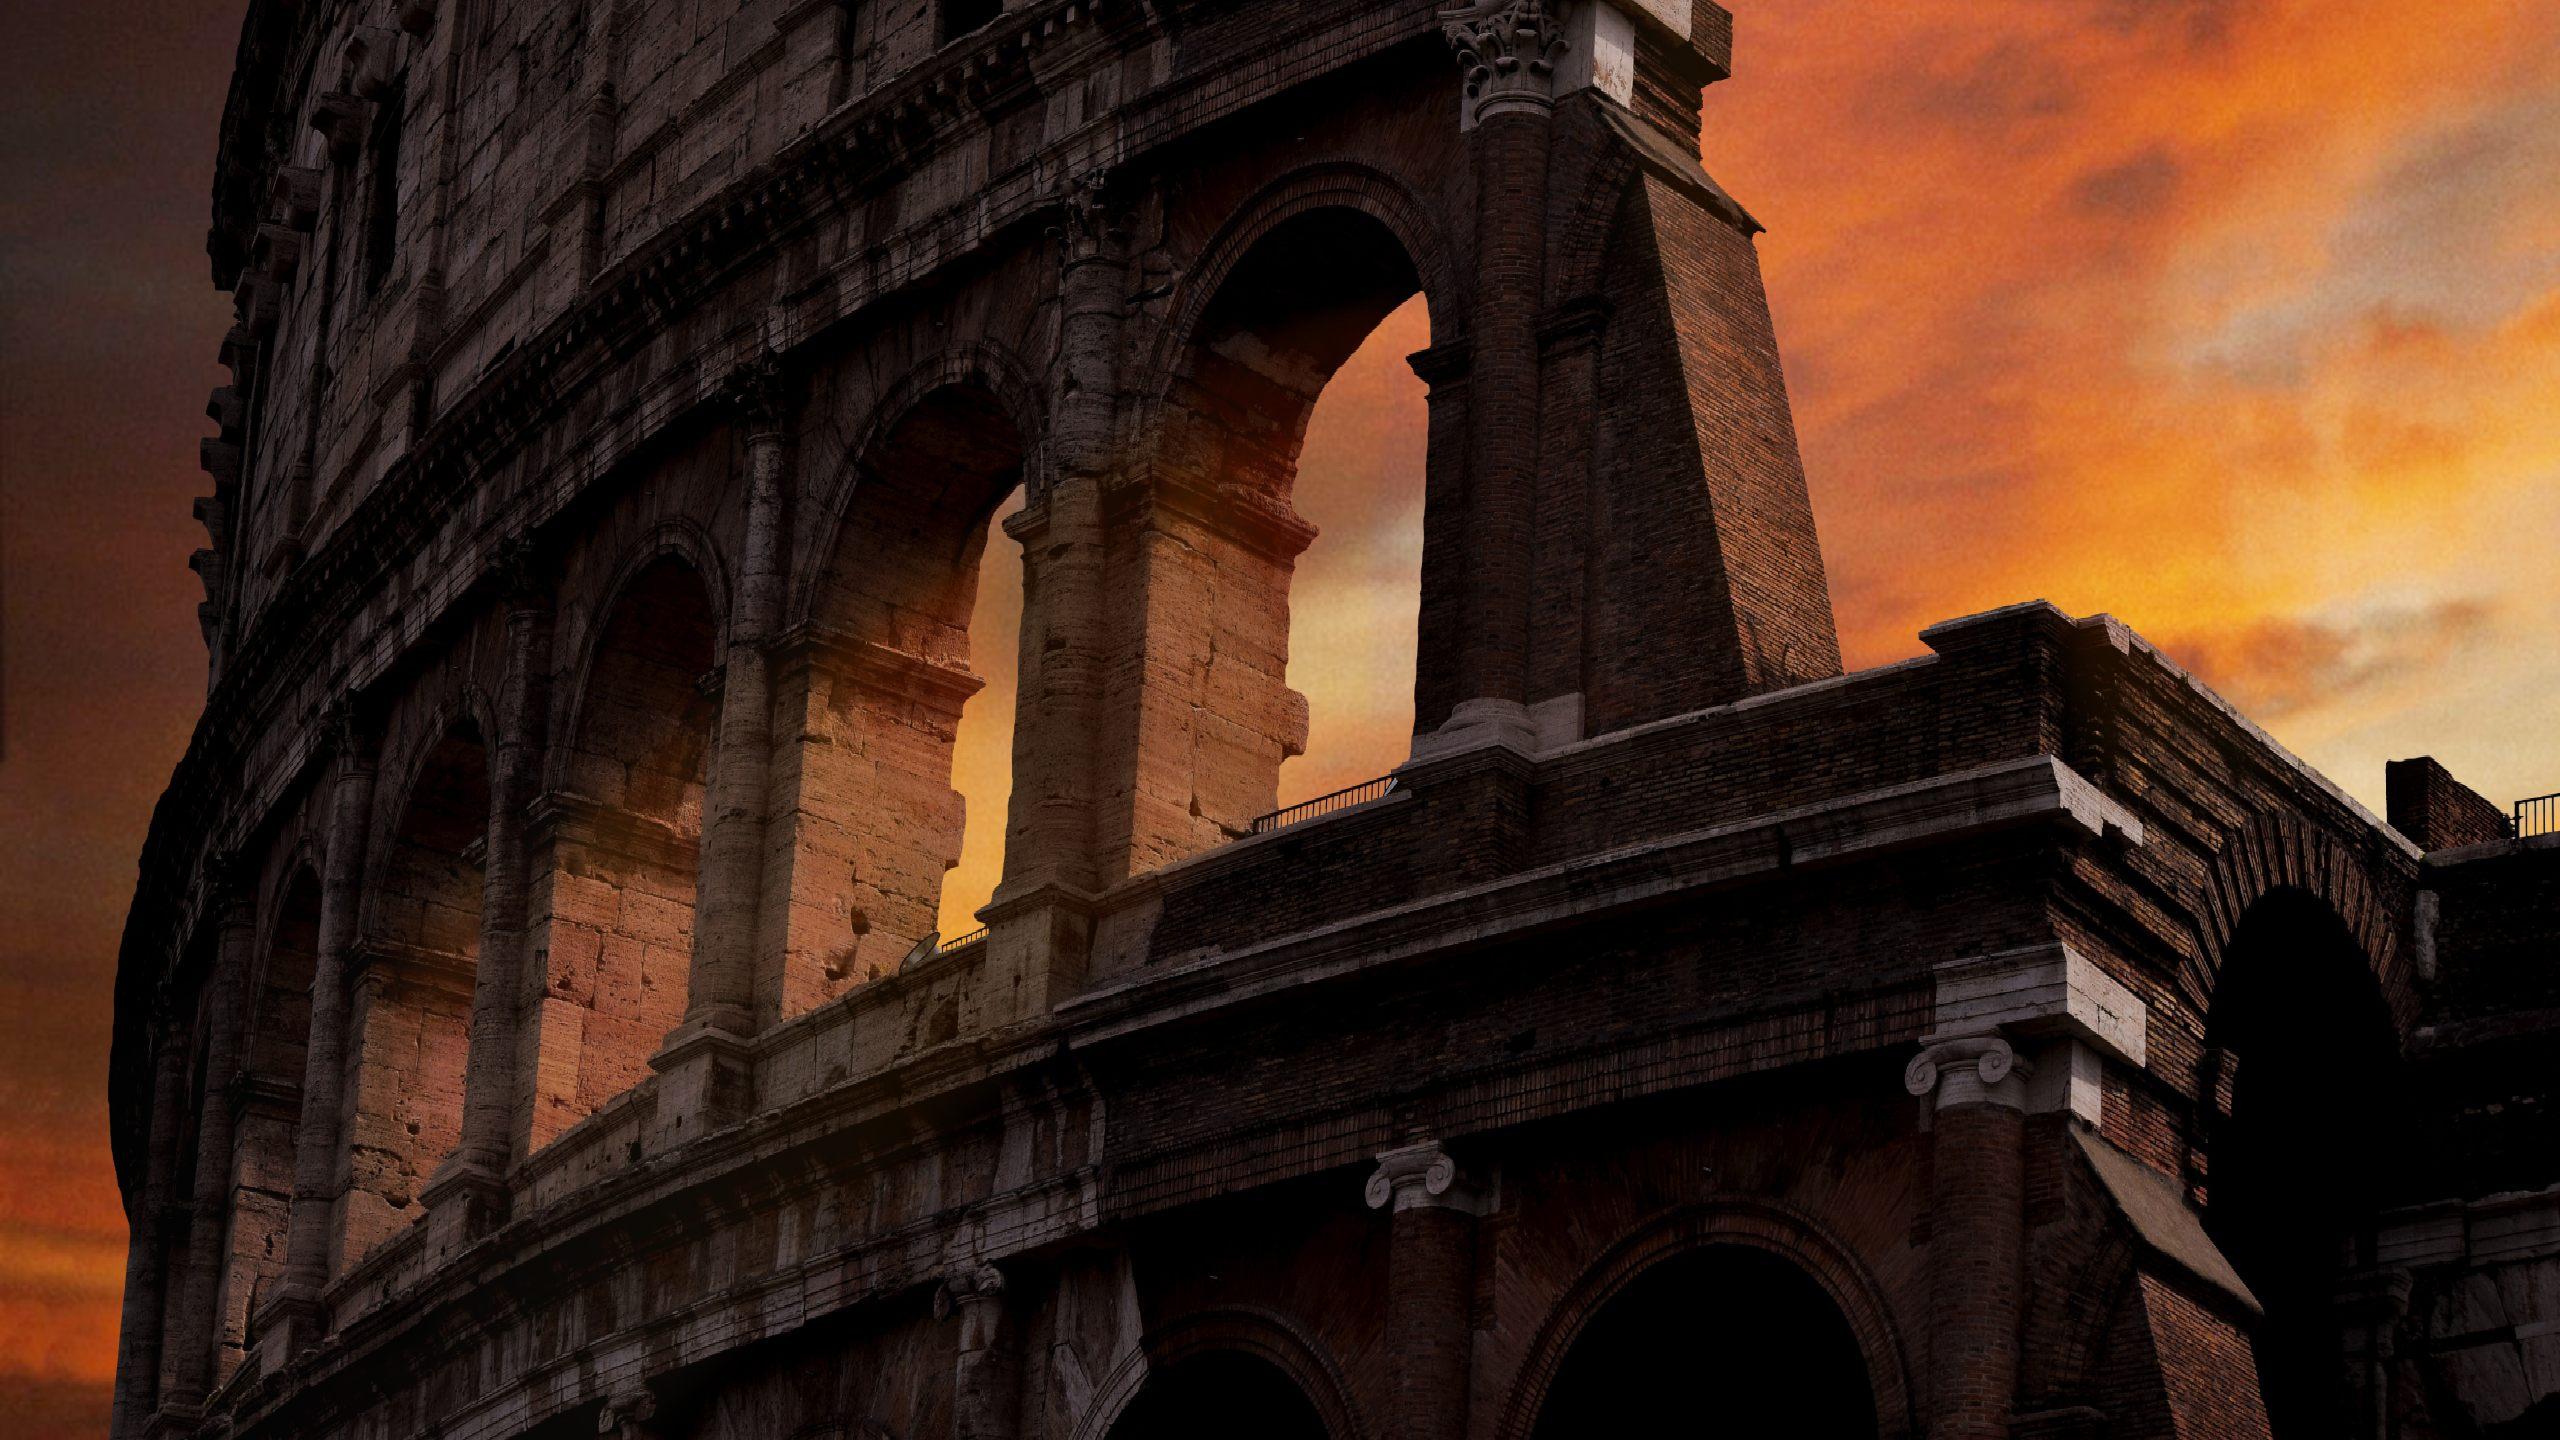 Blog-Quarta-Hospitality-in-Rome-Hotel-Regno-Rome